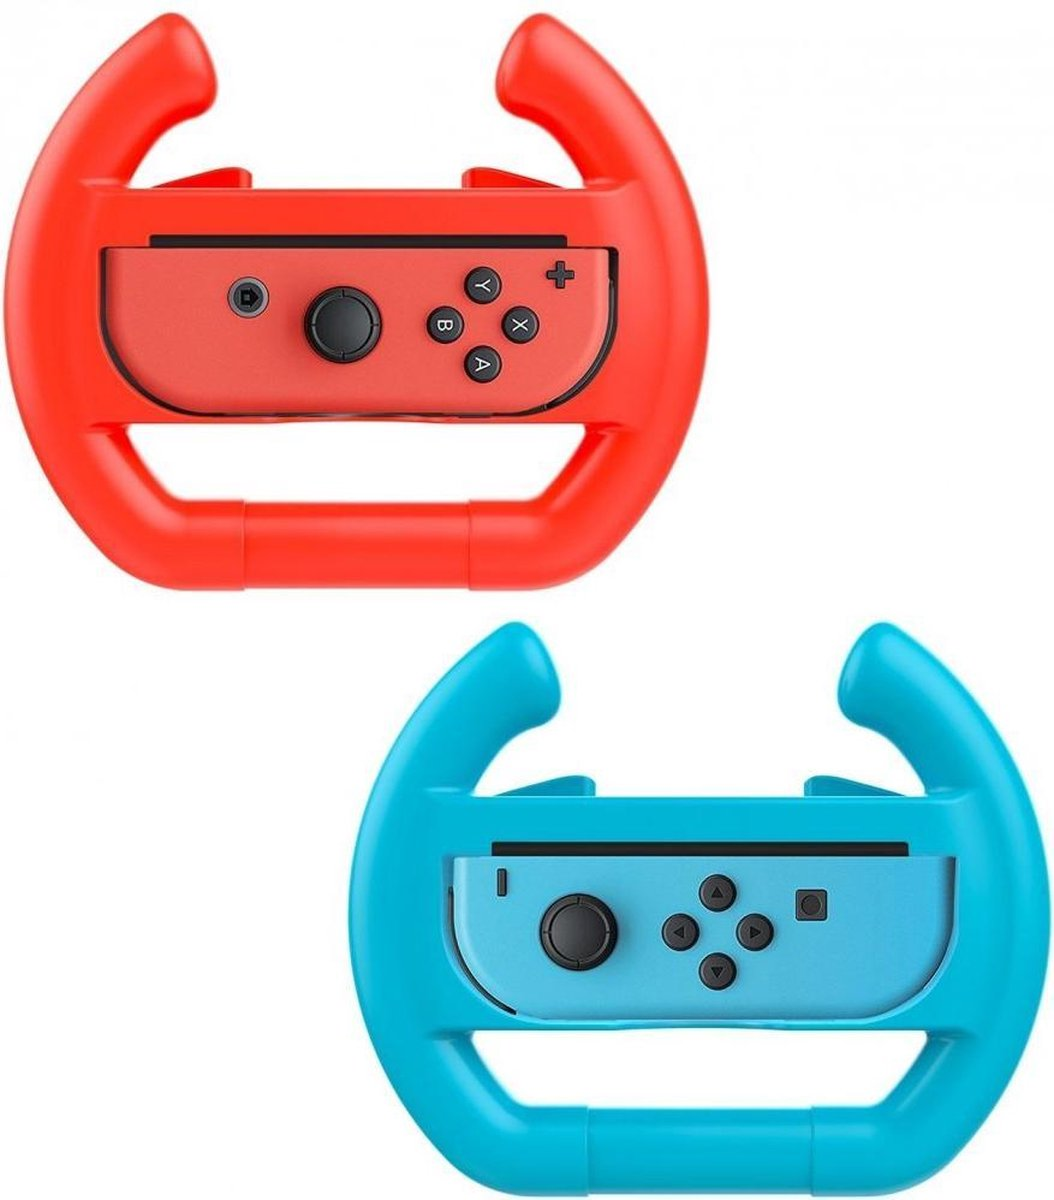 Nintendo Switch Stuur Controller Hoesje - Rood en Blauw